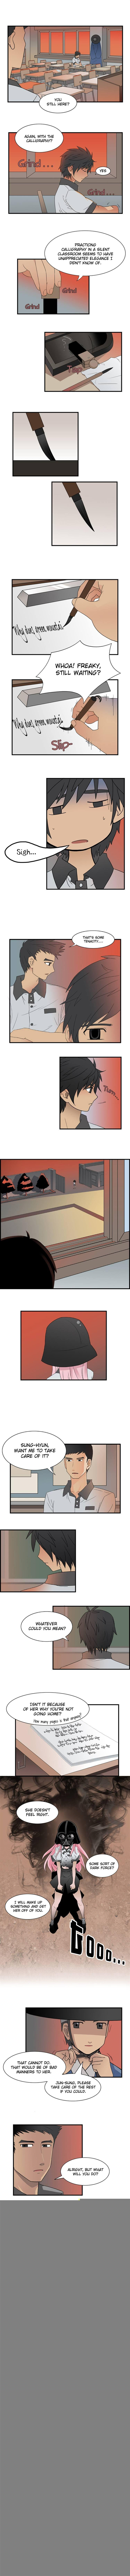 Eunha Romance Tale 4 Page 1